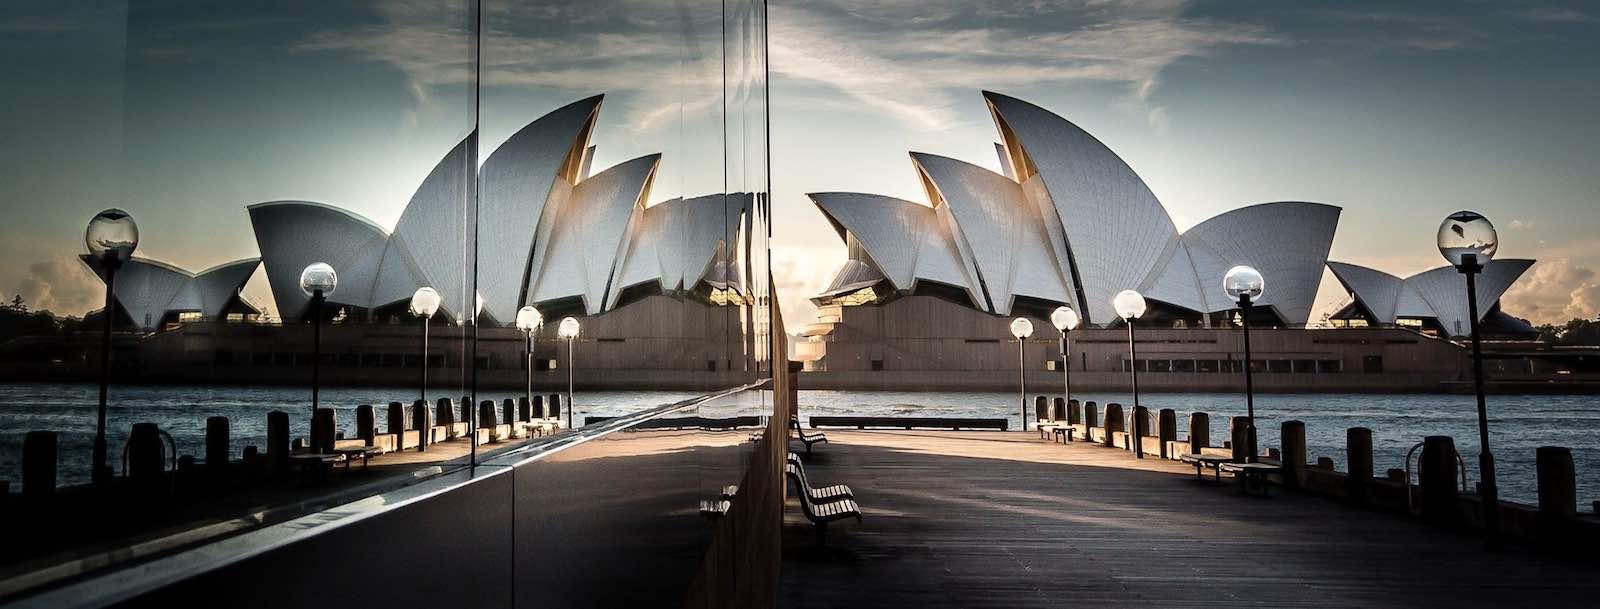 Sydney Opera House (Photo: Martin Snicer/Flickr)